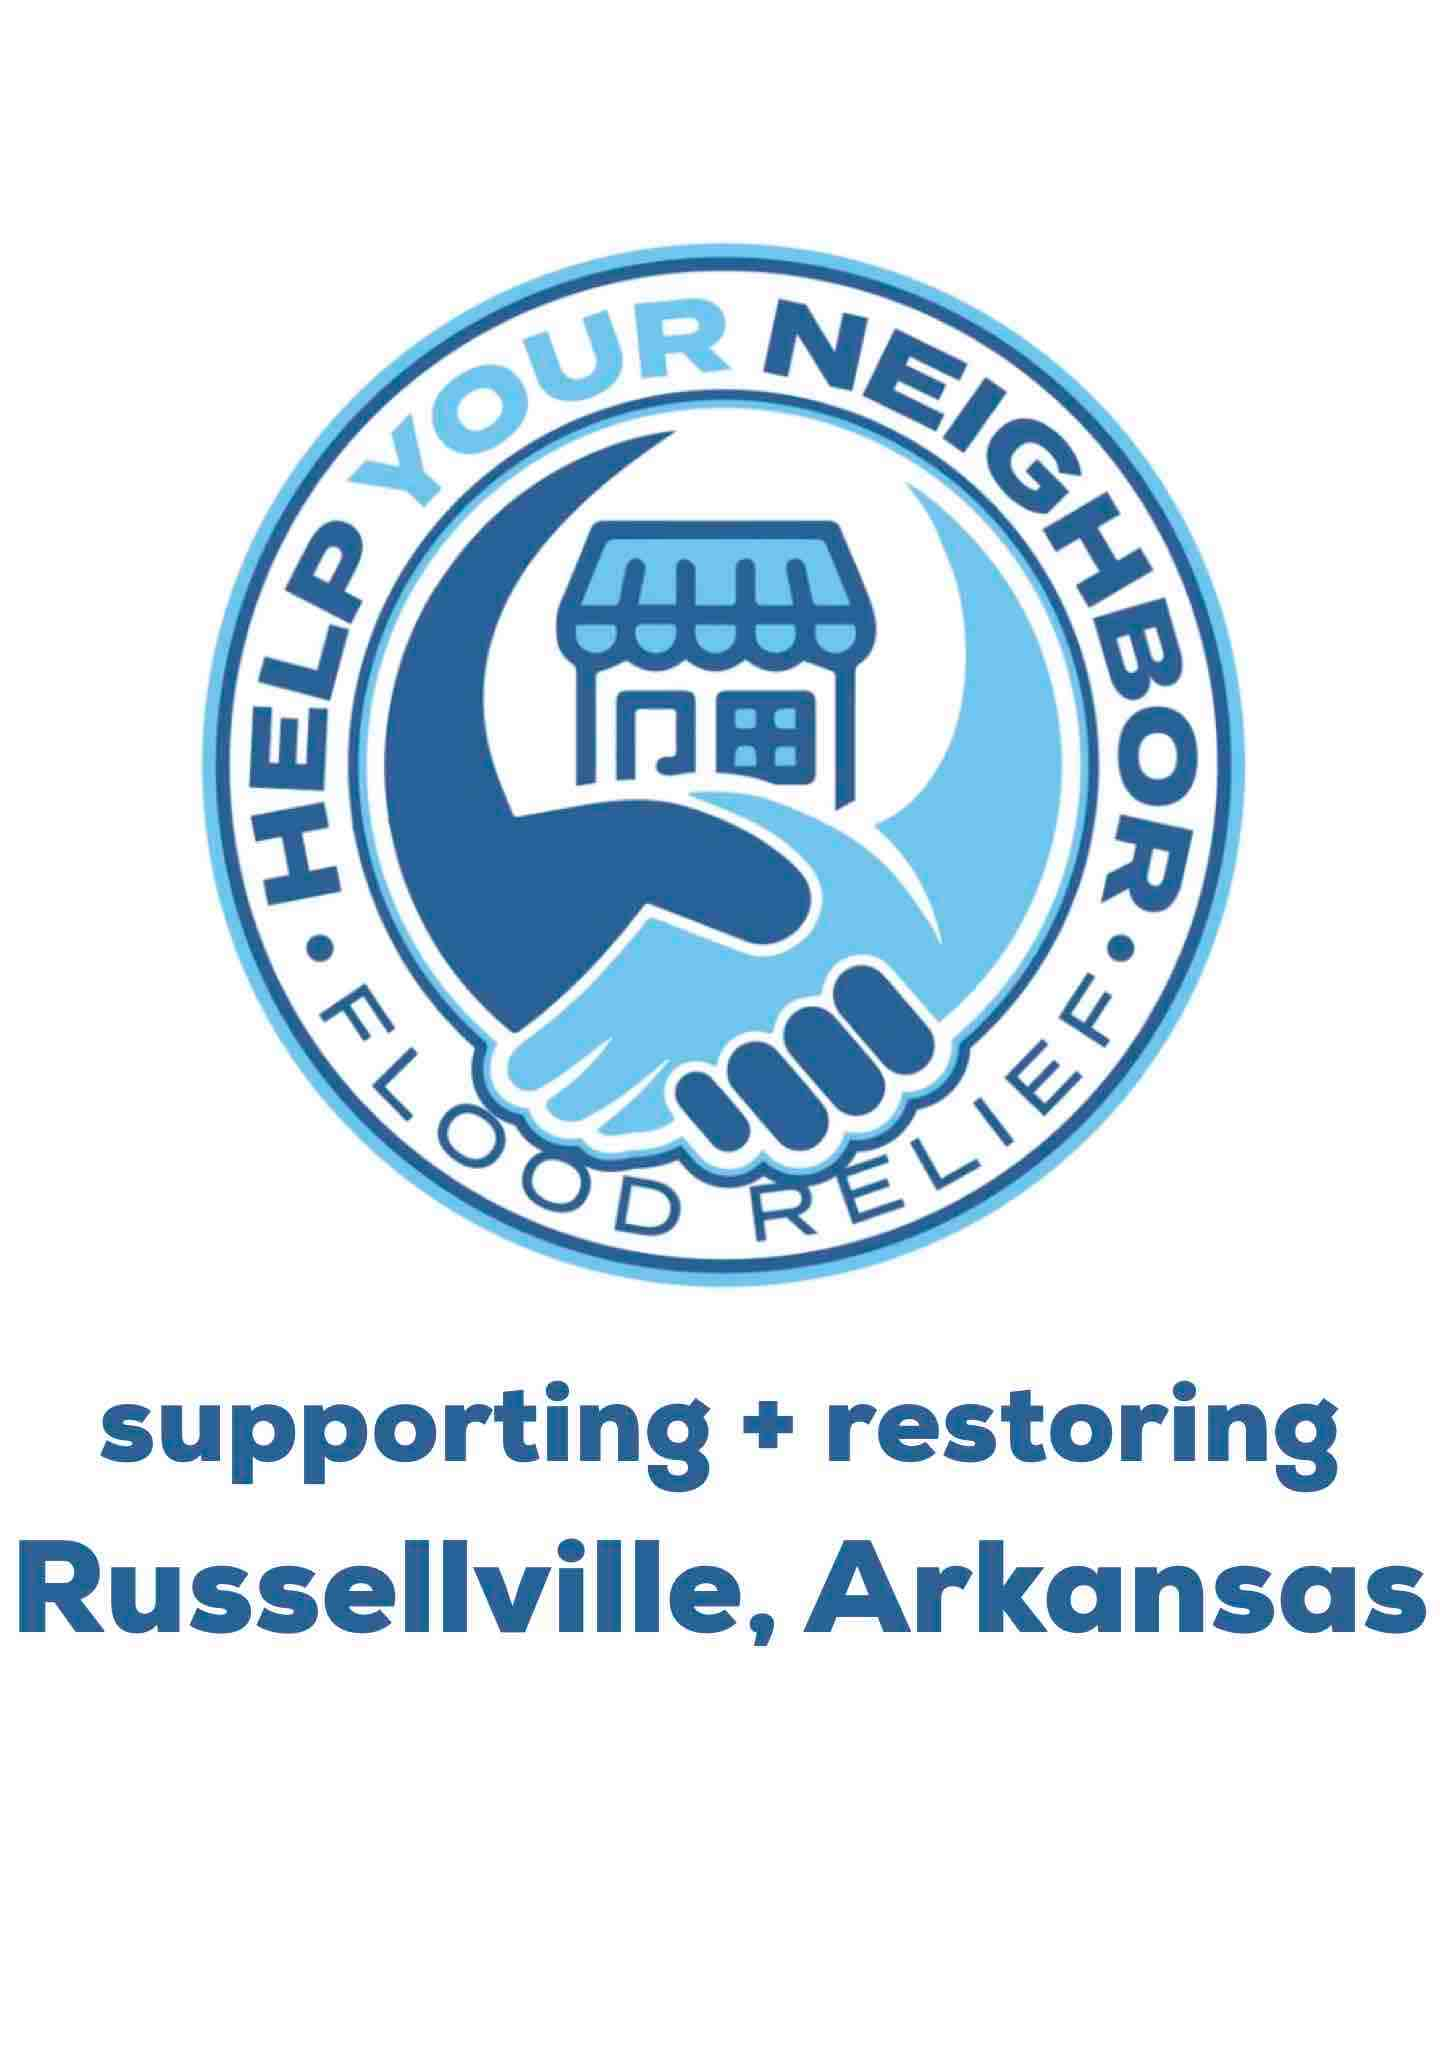 Flood Relief Day Russellville_r_1560371371954-118809306.jpg